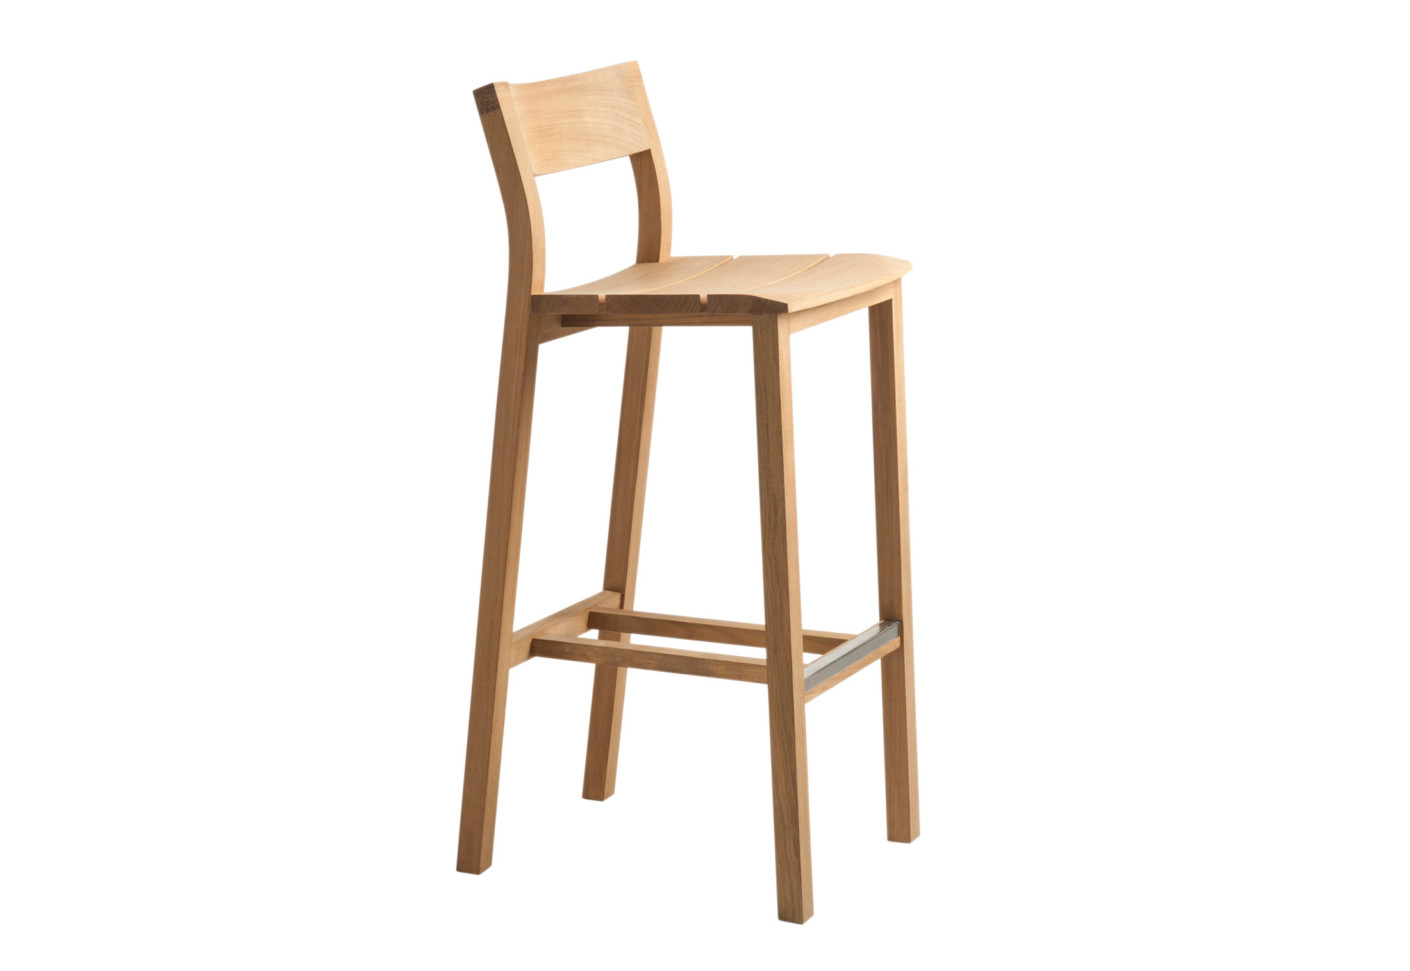 sc 1 st  Stylepark & Kos teak bar stool by Tribù | STYLEPARK islam-shia.org